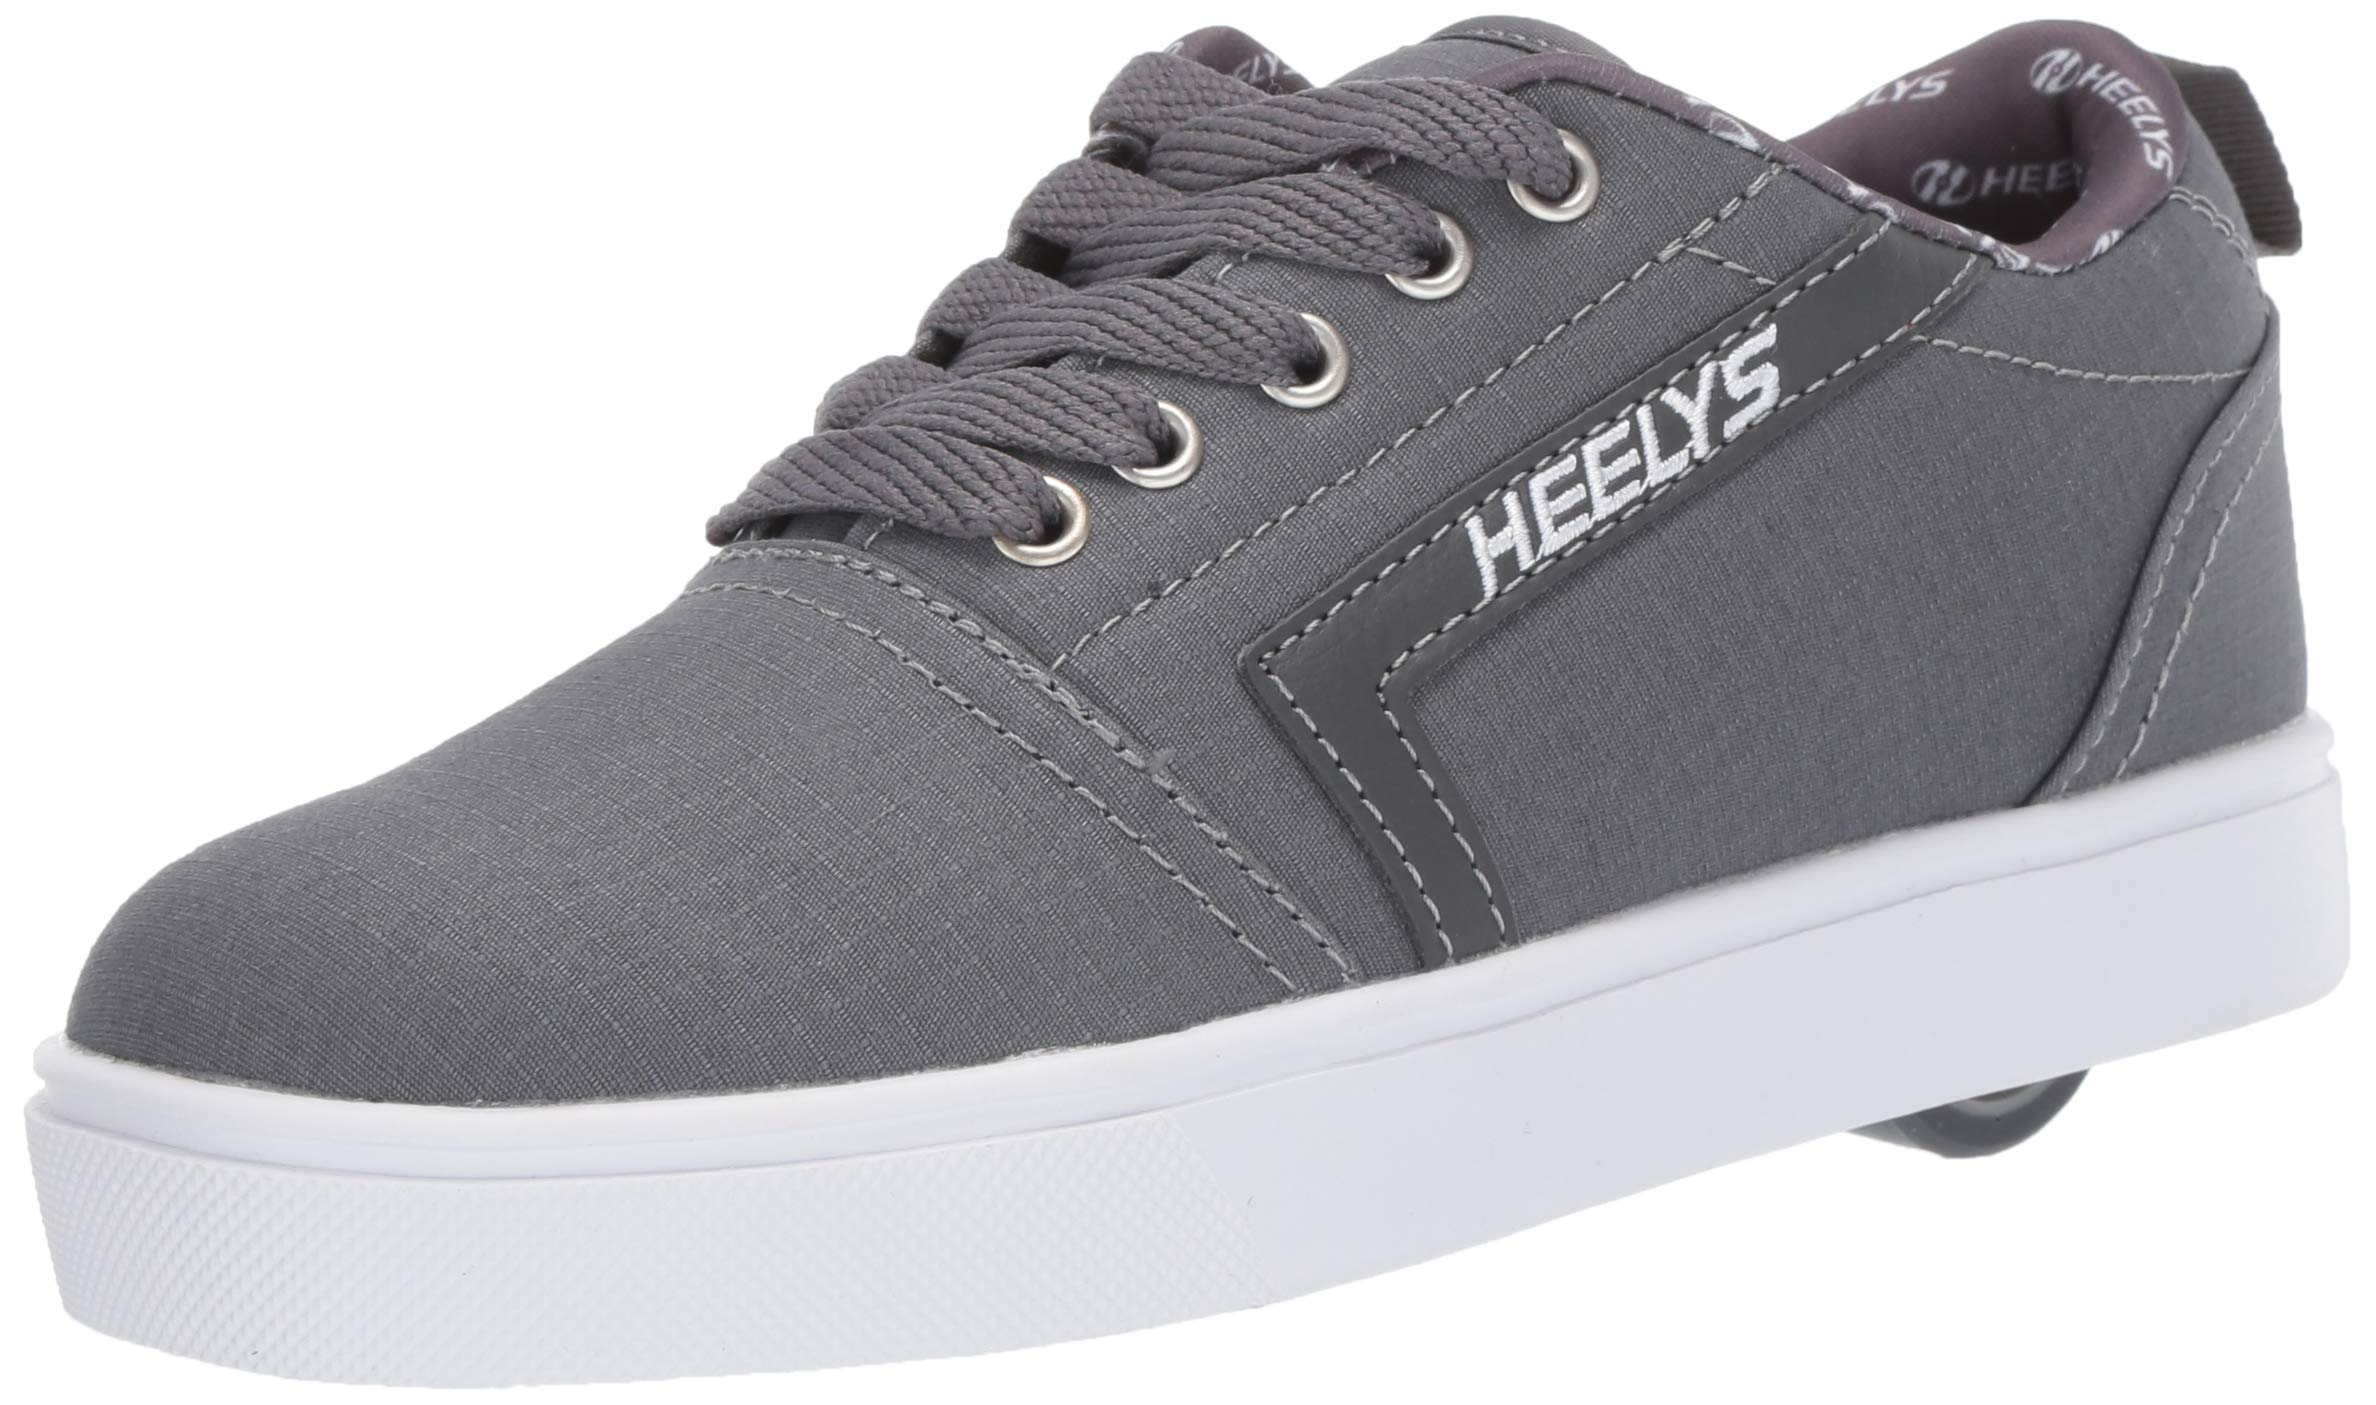 Heelys Boys' GR8 Pro Tennis Shoe, Charcoal/White RIP Stop, 1 M US Big Kid